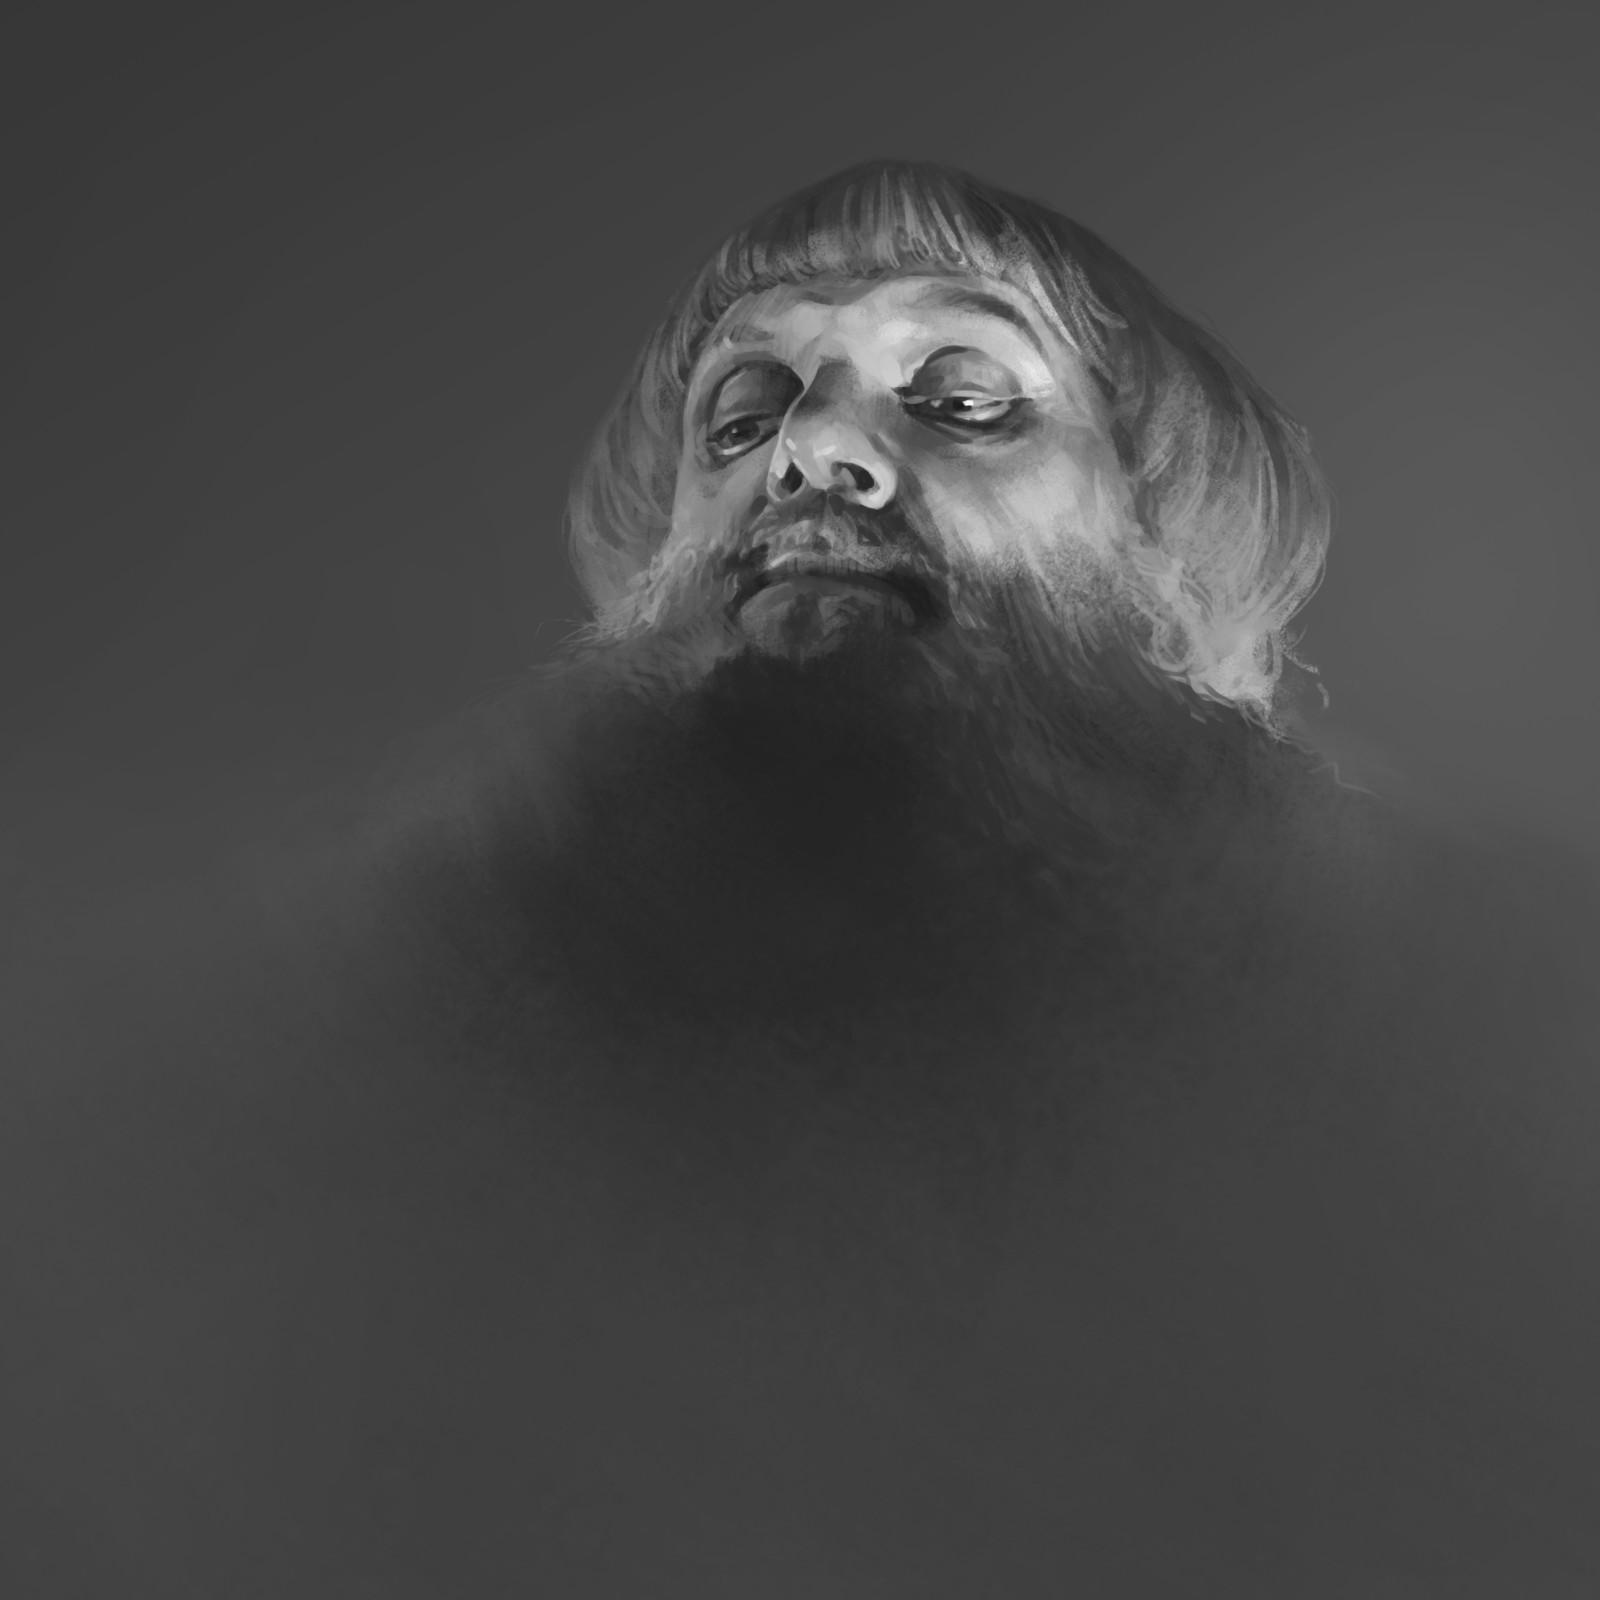 Kolychev-Nemyatyi